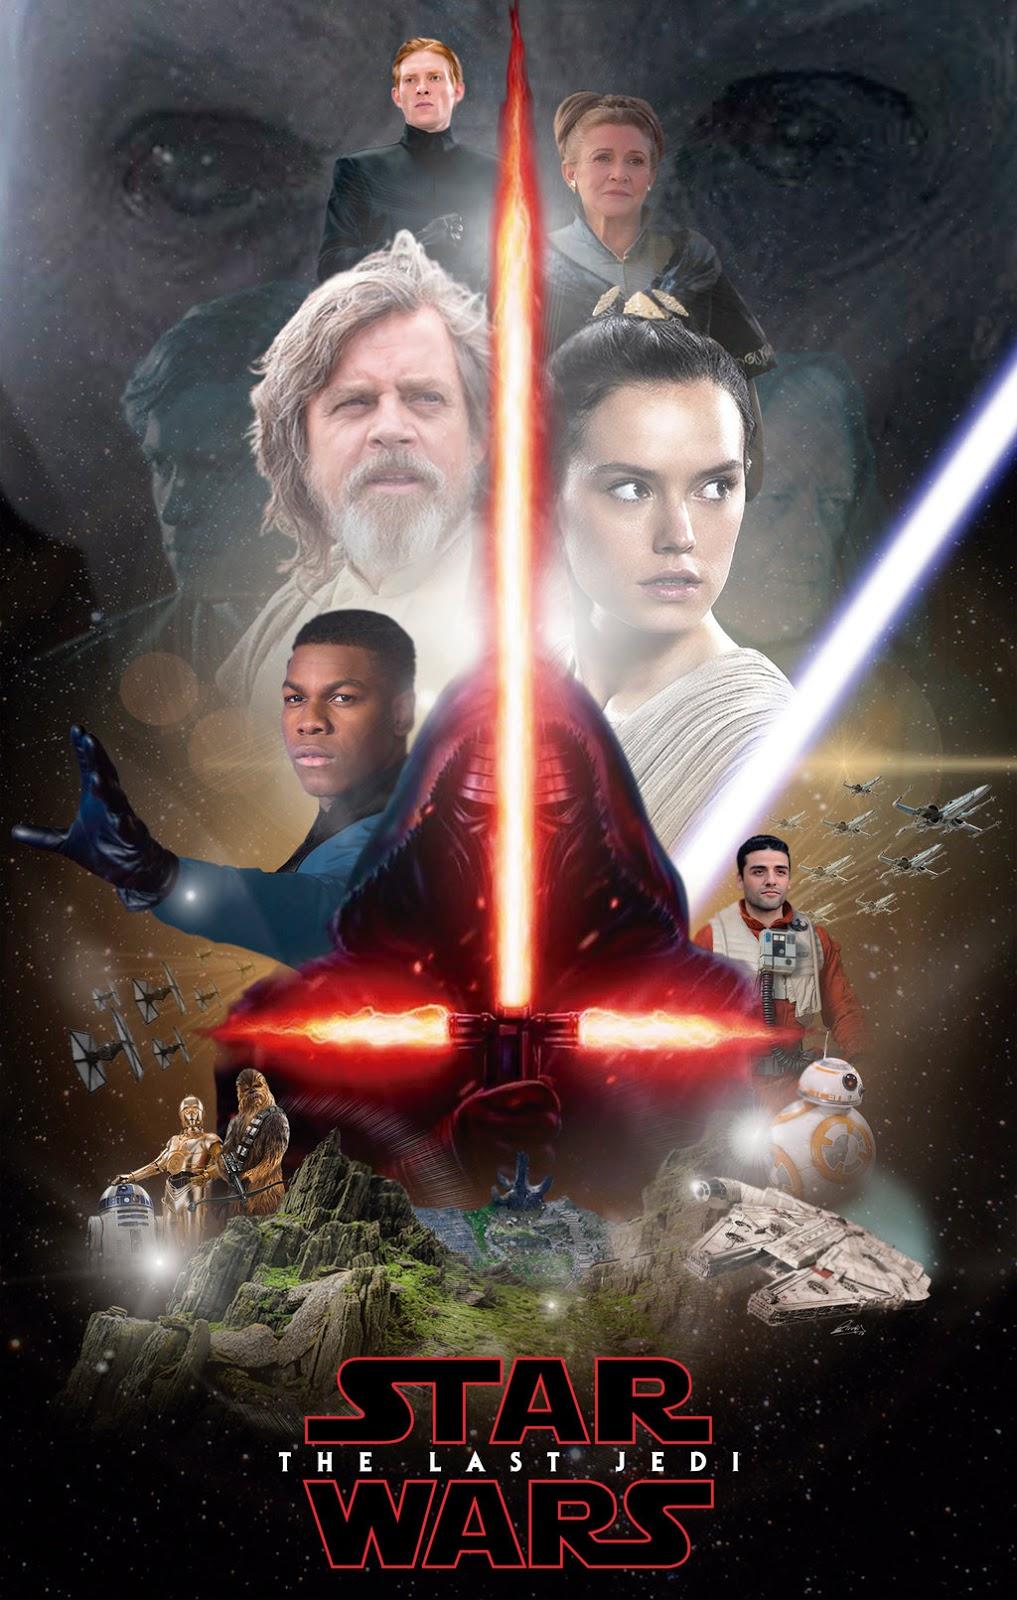 star wars 7 stream hd filme